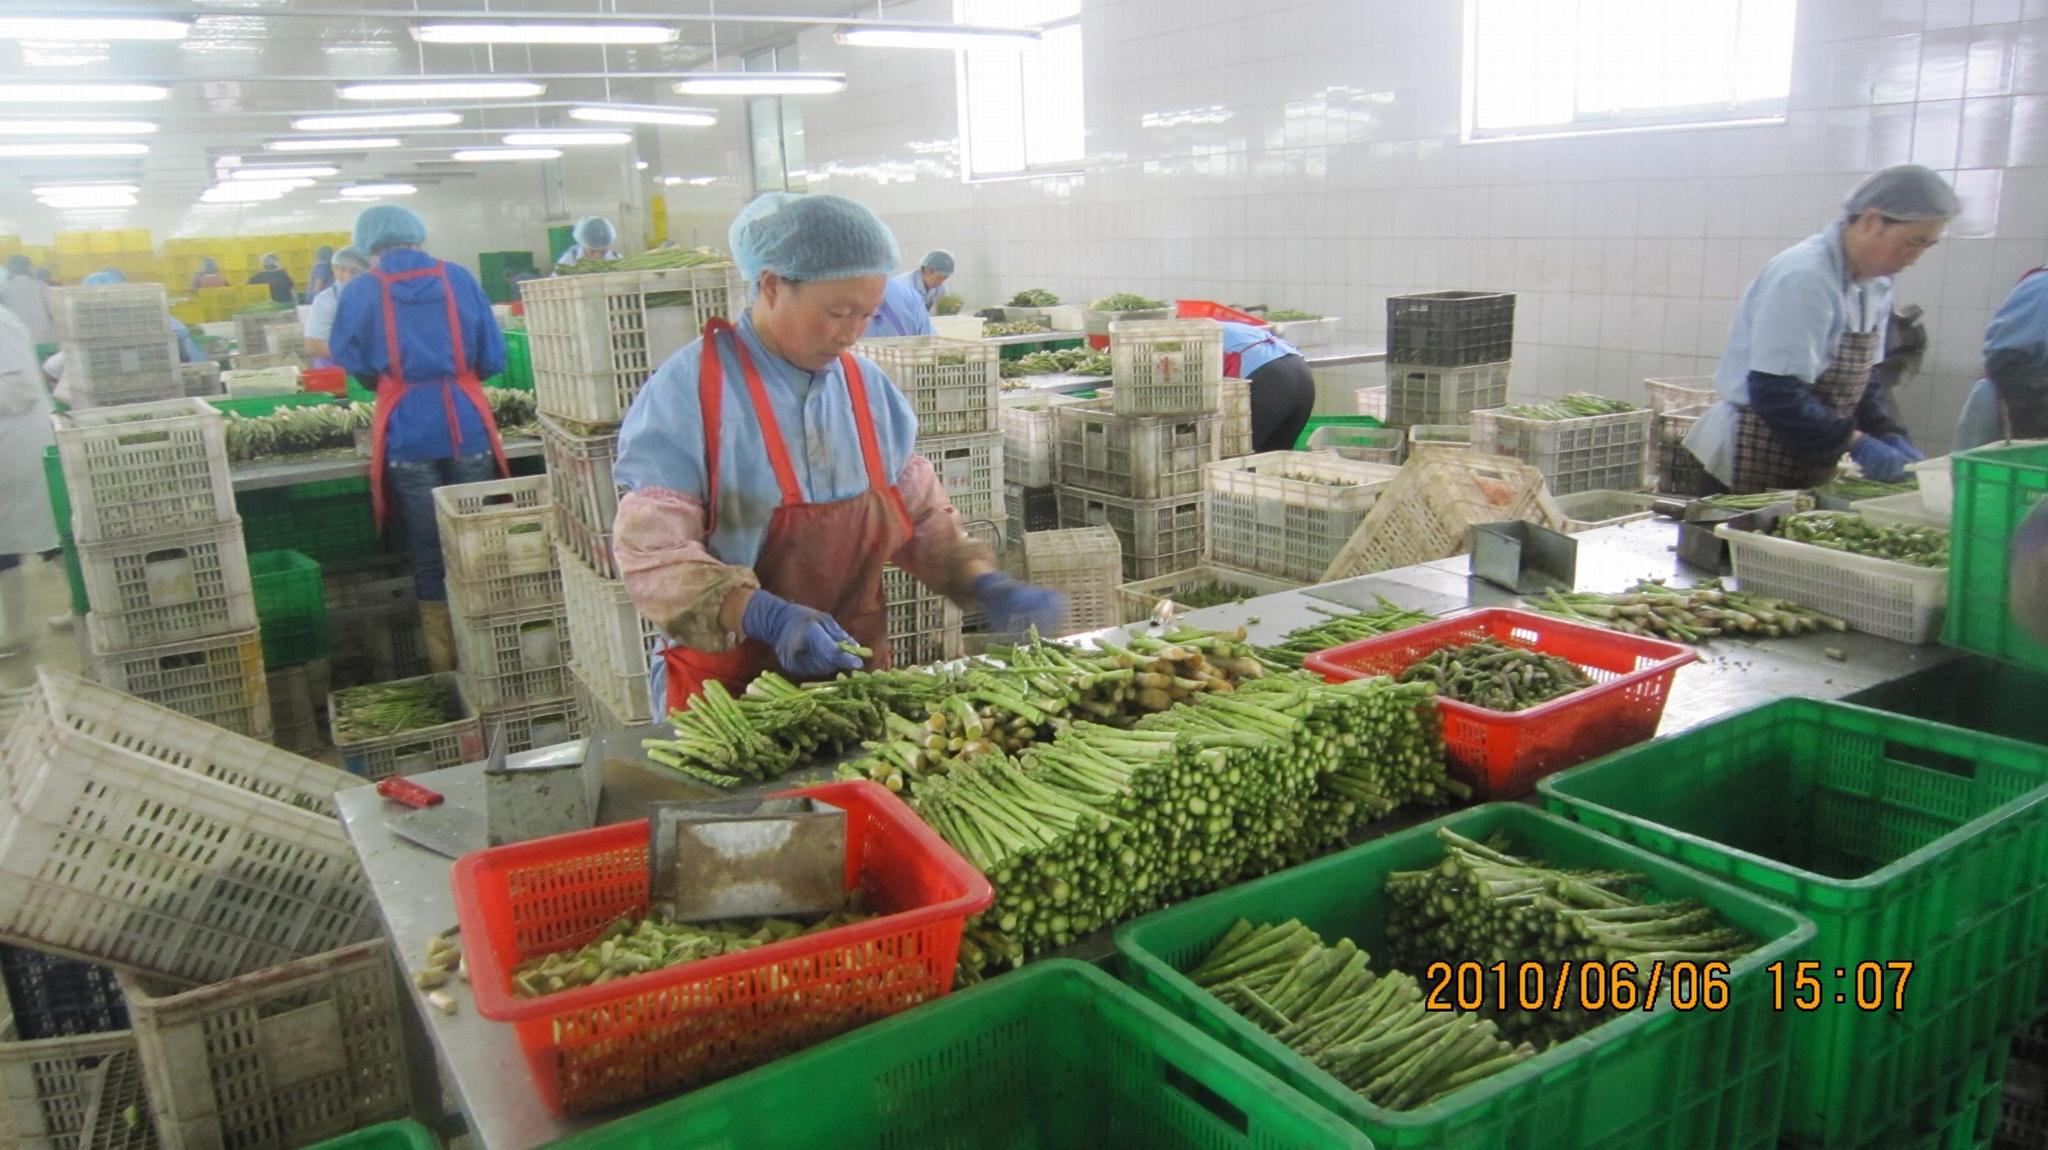 IQF Green Asparagus Cuts & Tips,Frozen Green Asparagus Tips & Cuts 9